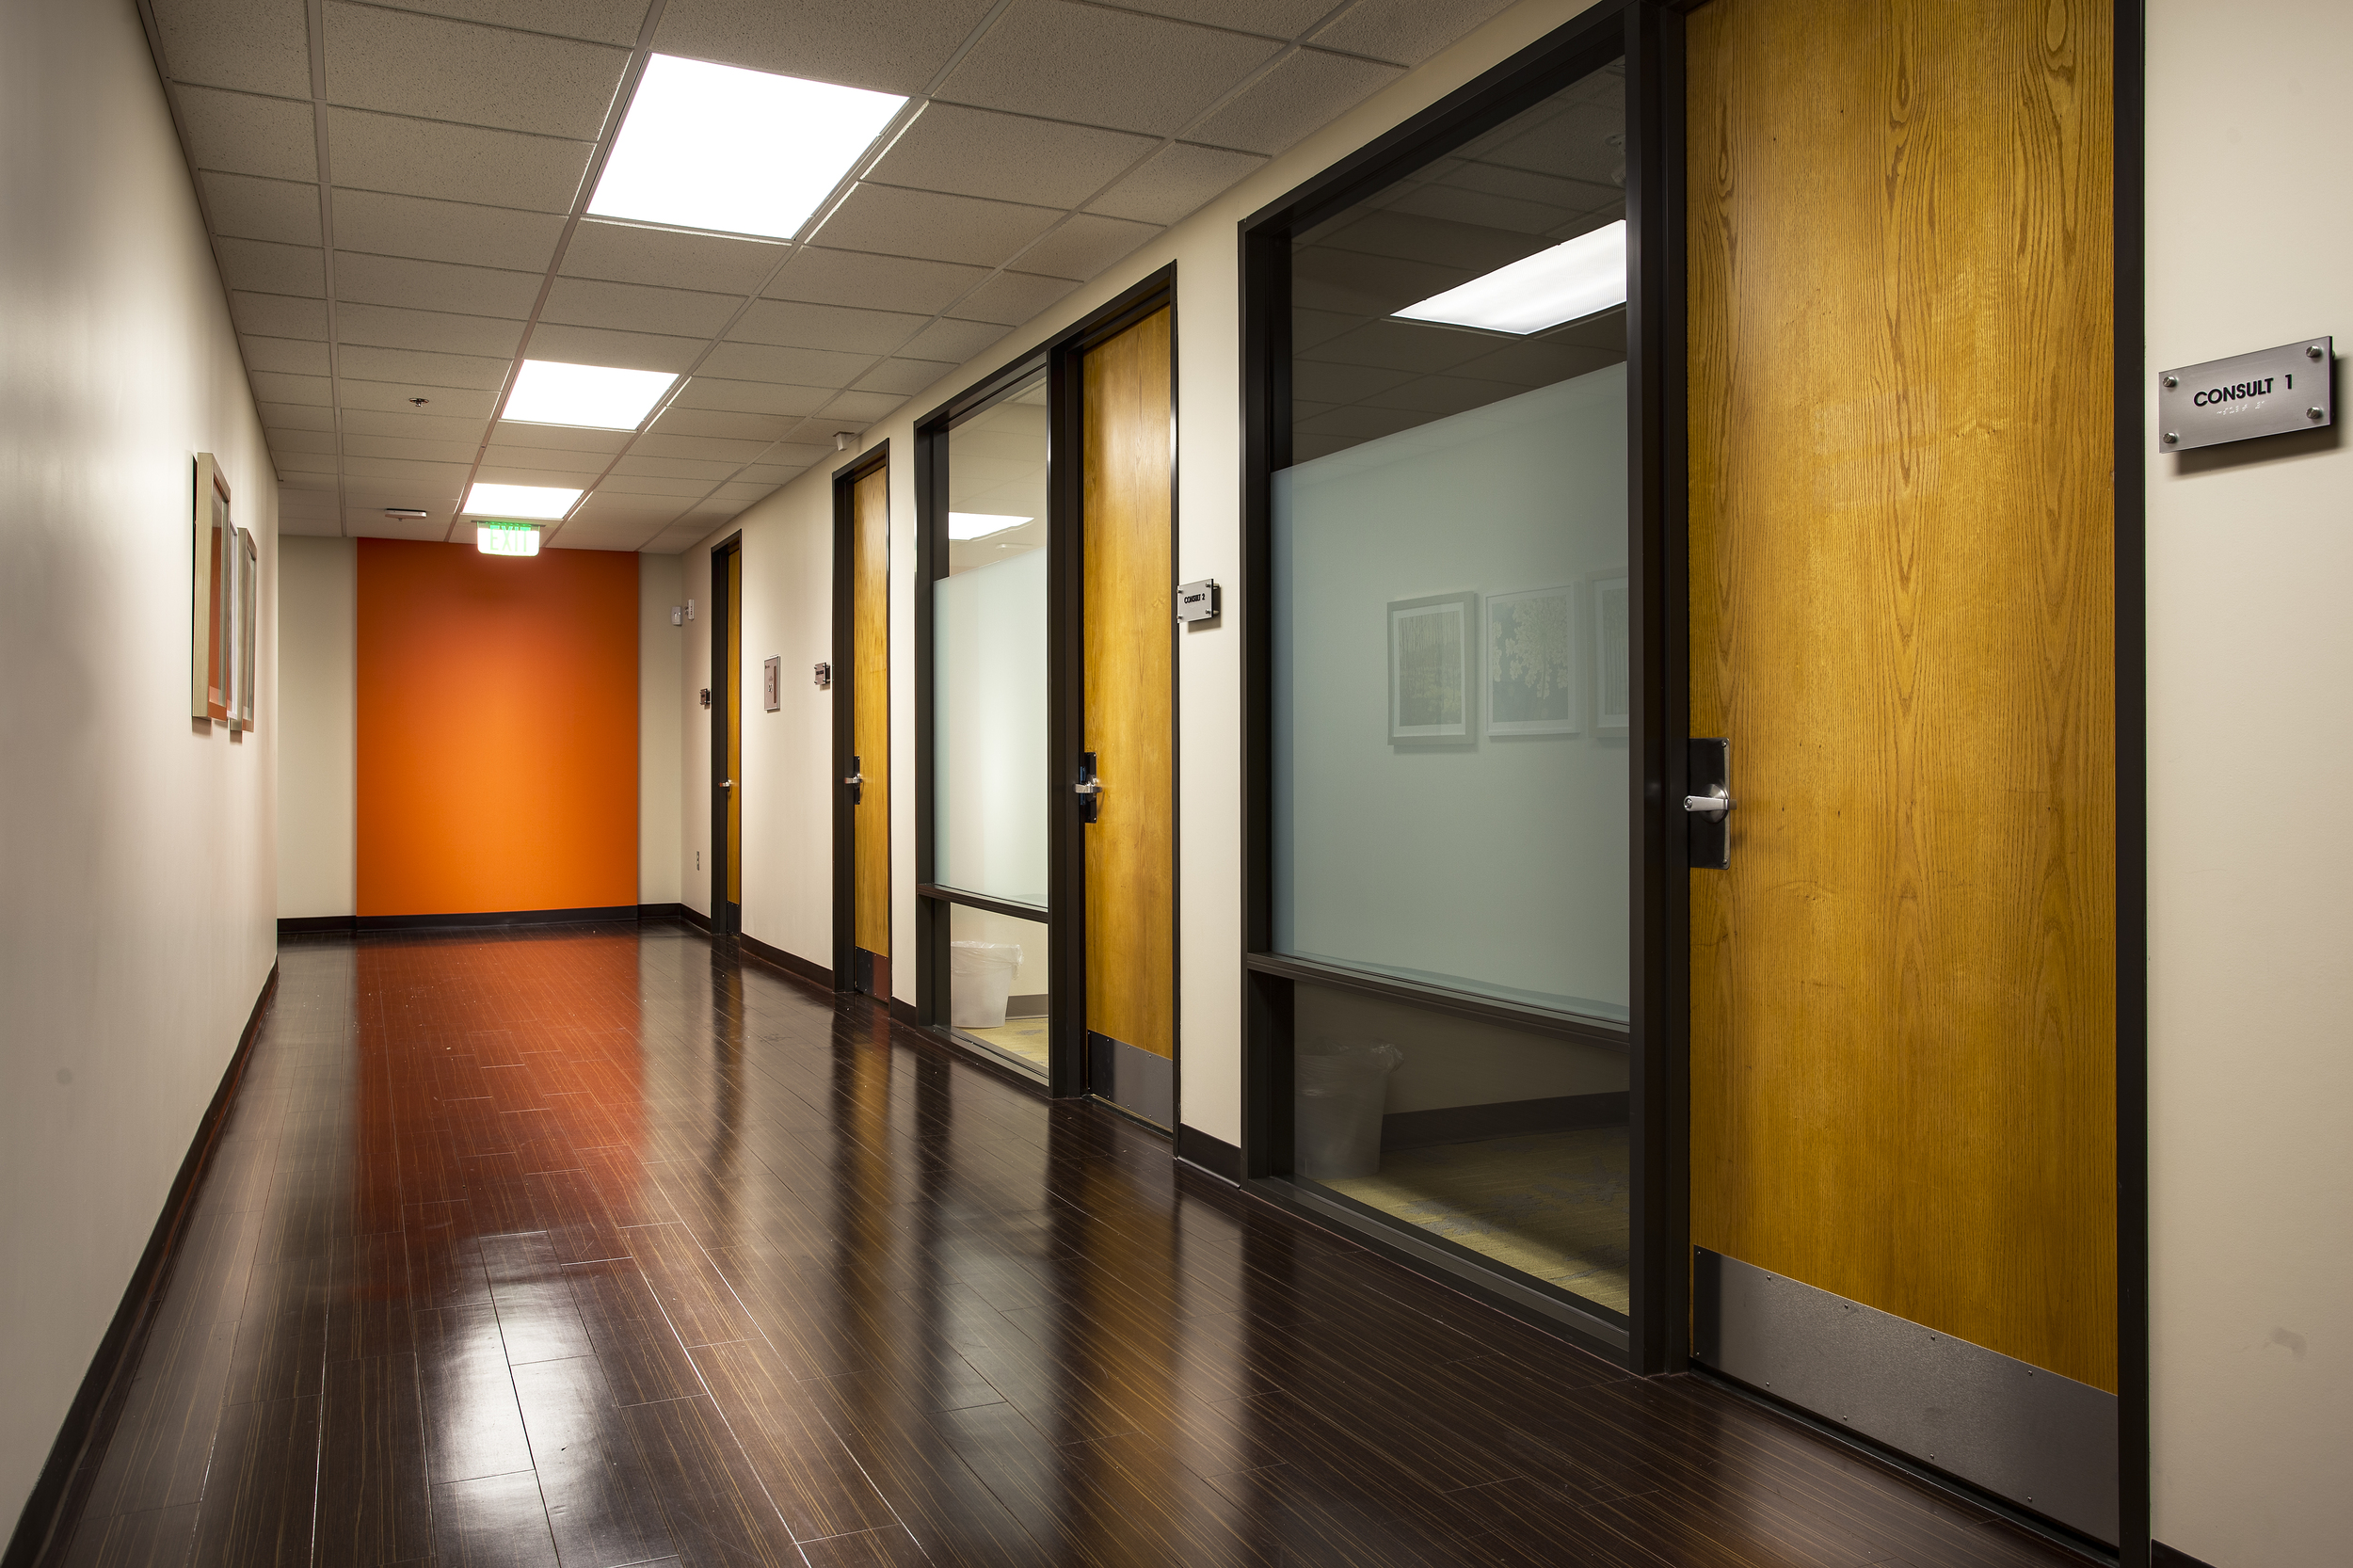 Dr-Monteith-Consultation-Hallway.jpg